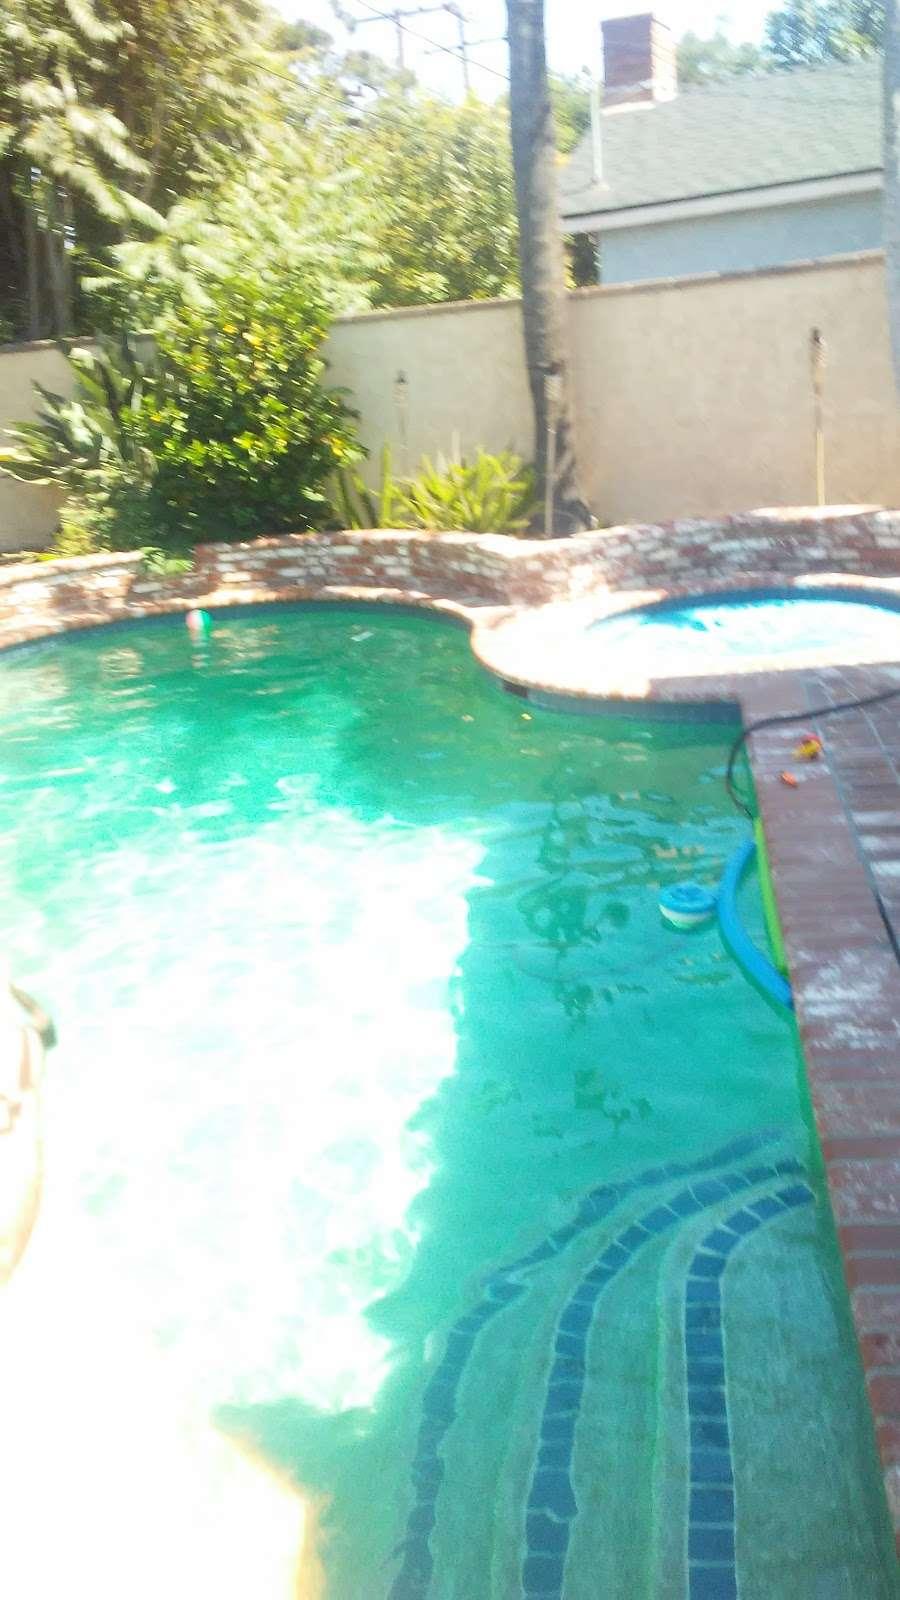 Mike Crosby Realty - real estate agency    Photo 1 of 1   Address: 13511 Biola Ave, La Mirada, CA 90638, USA   Phone: (714) 742-2897